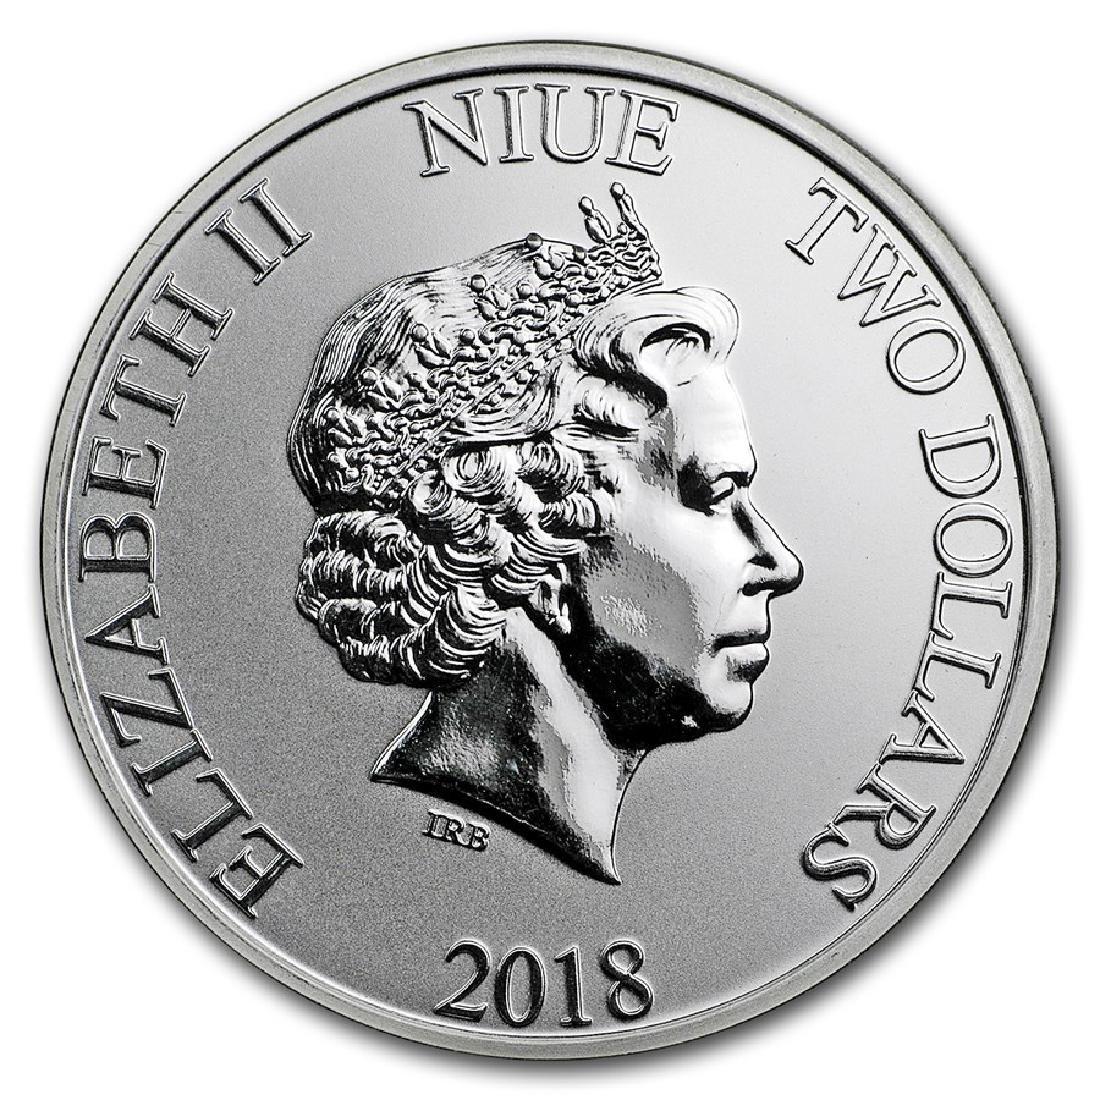 2018 $2 Disney Scrooge McDuck Niue Silver Coin - 2